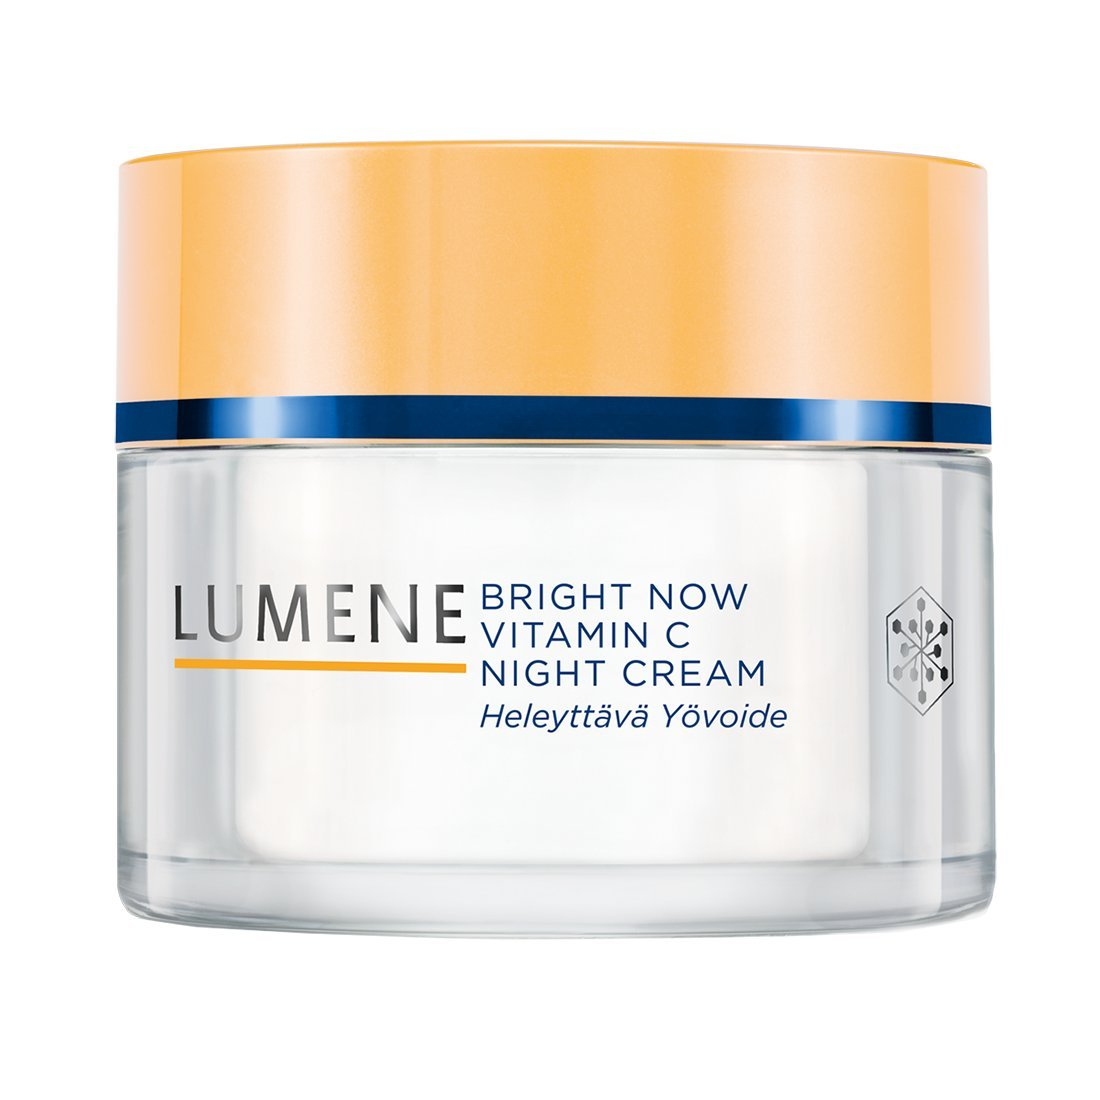 Lumene Bright Now Vitamin C Sleeping Cream 1.7 Fl.Oz. 50ml